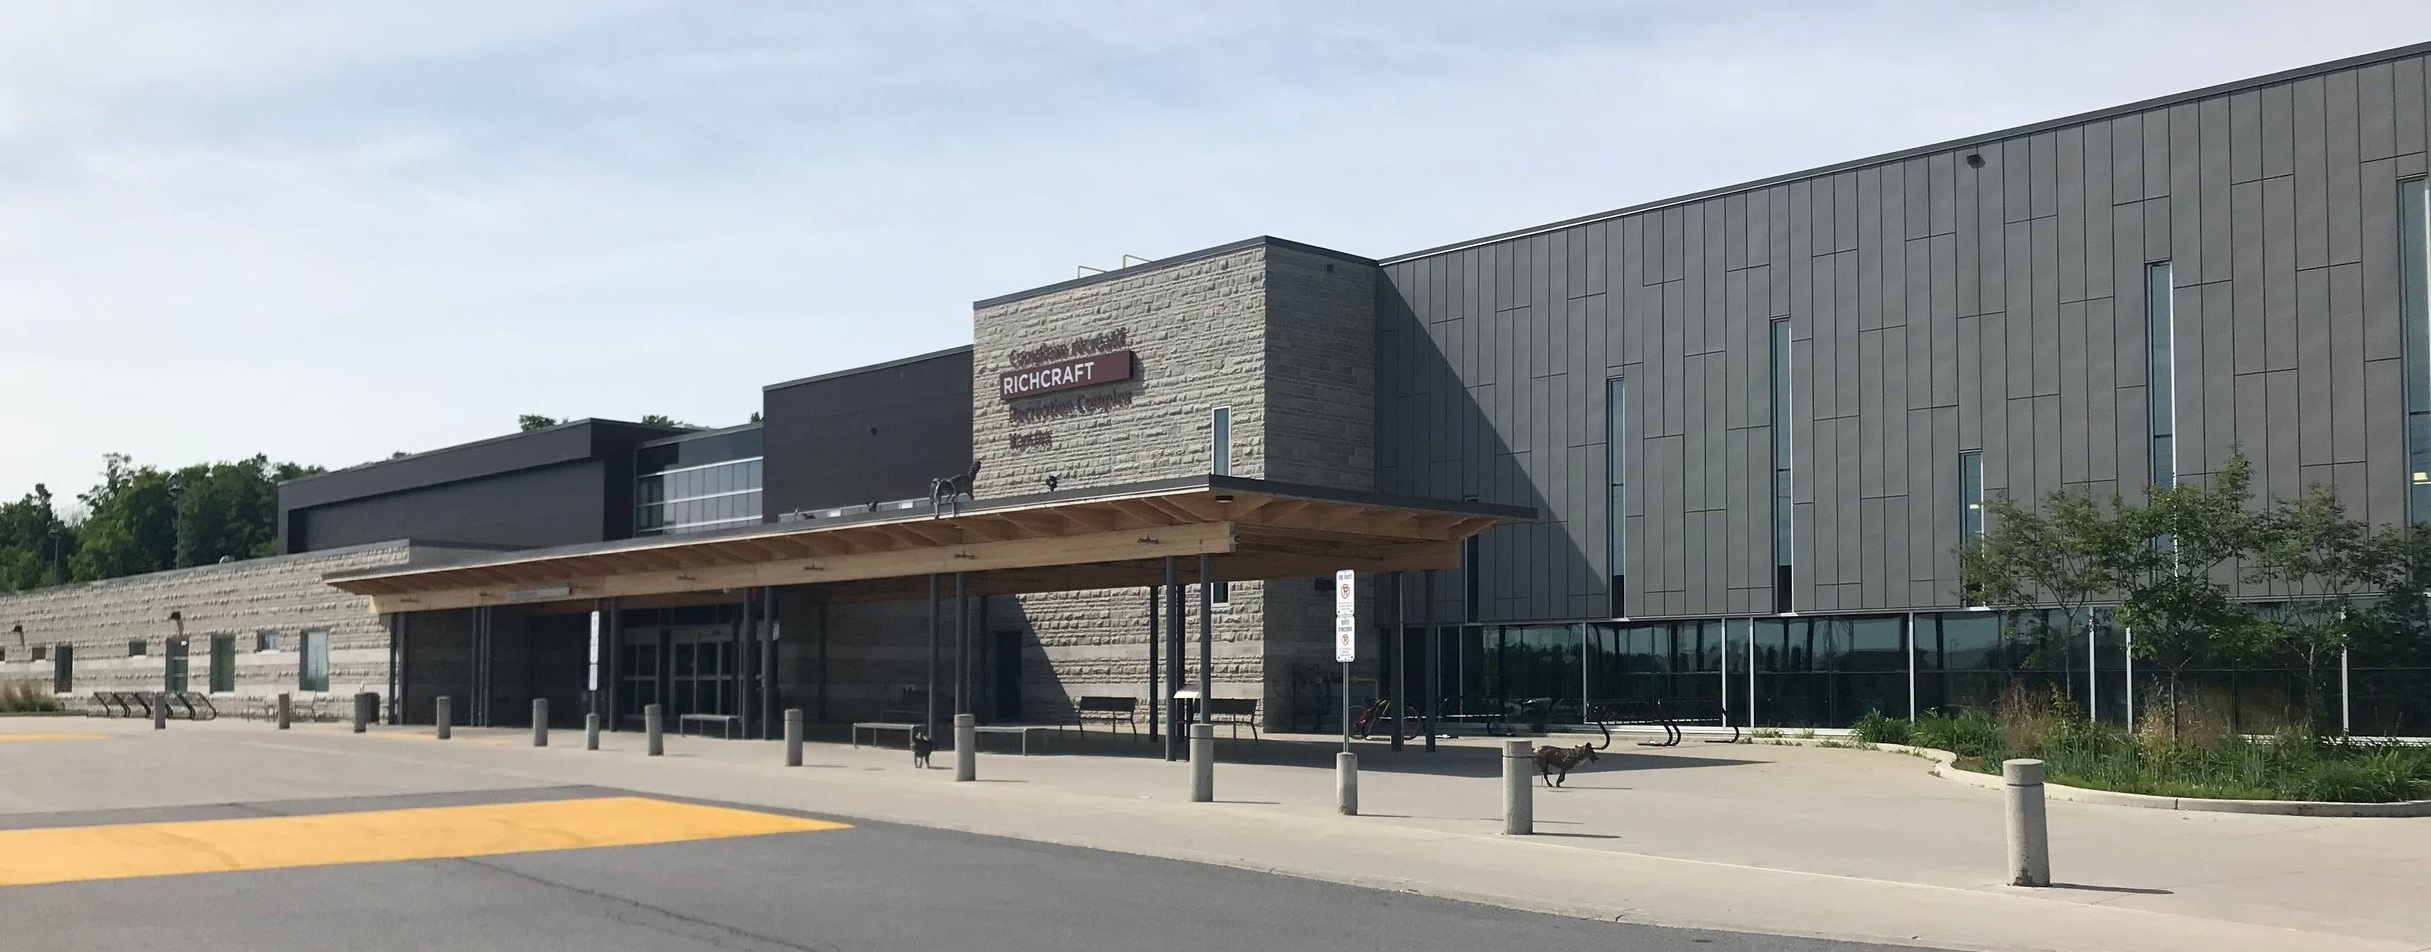 Richcraft Recreation Center (Kanata)